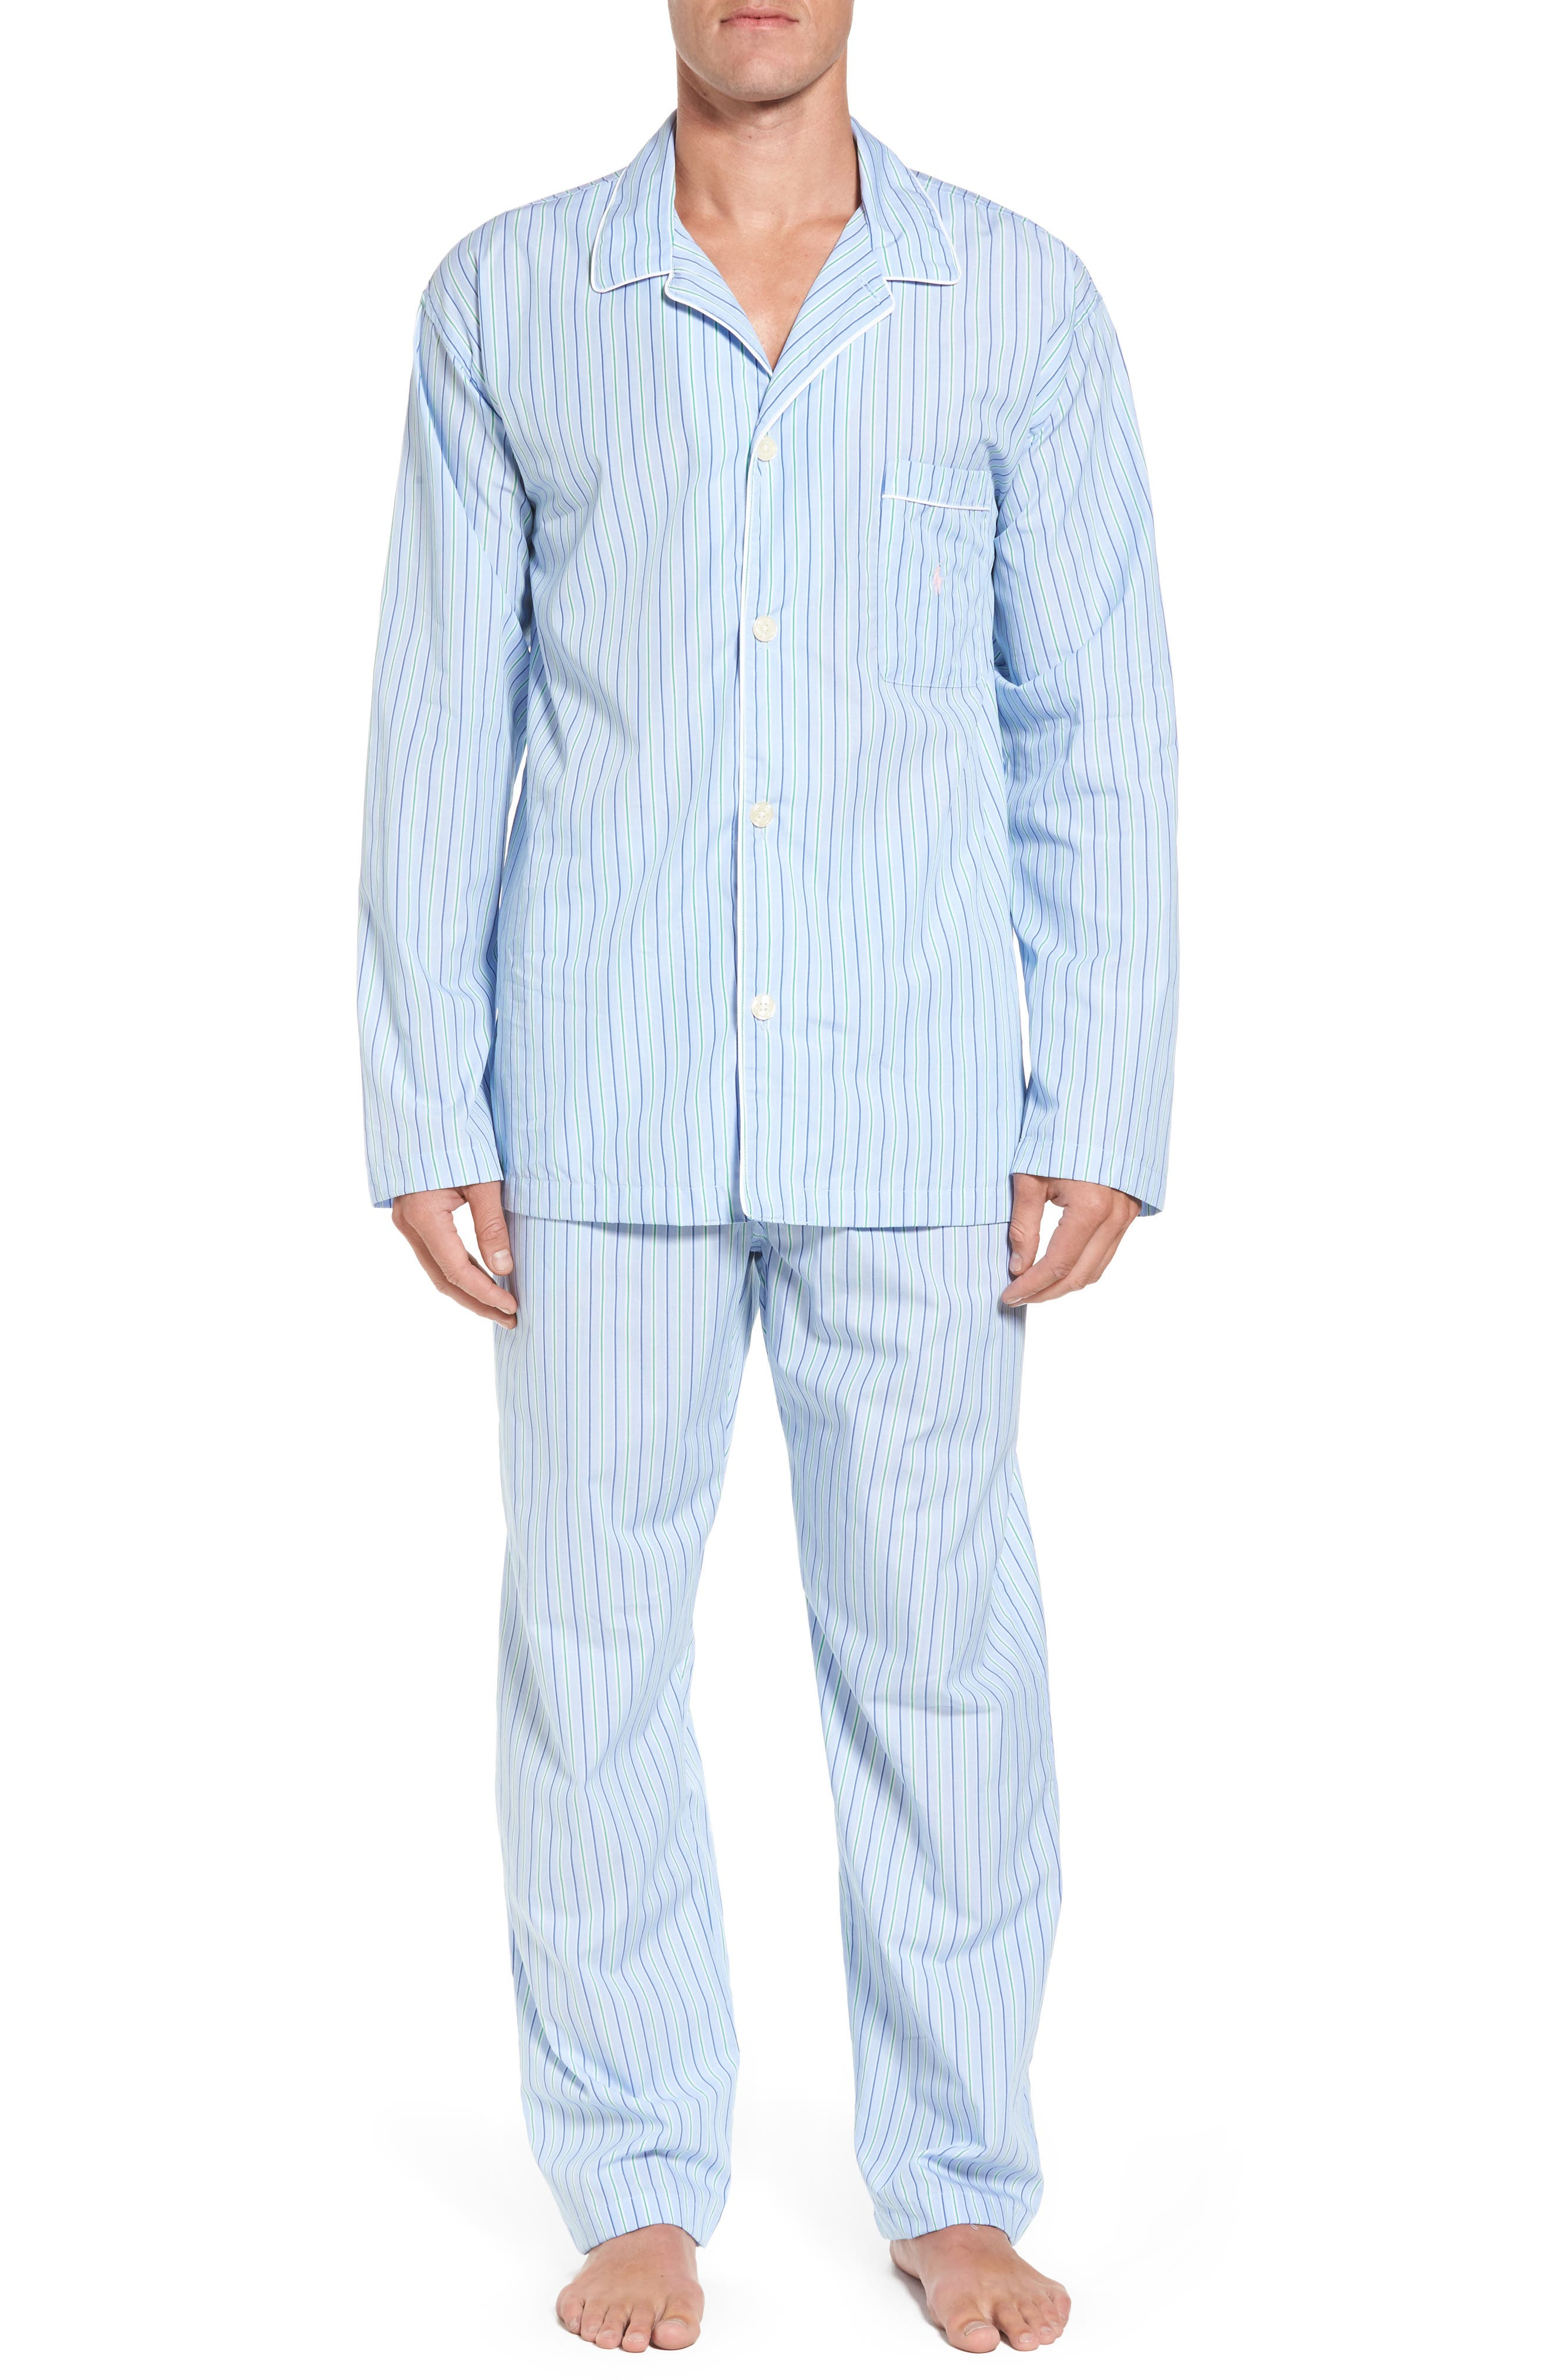 Cotton Pajama Top,                             Main thumbnail 1, color,                             BARI STRIPE